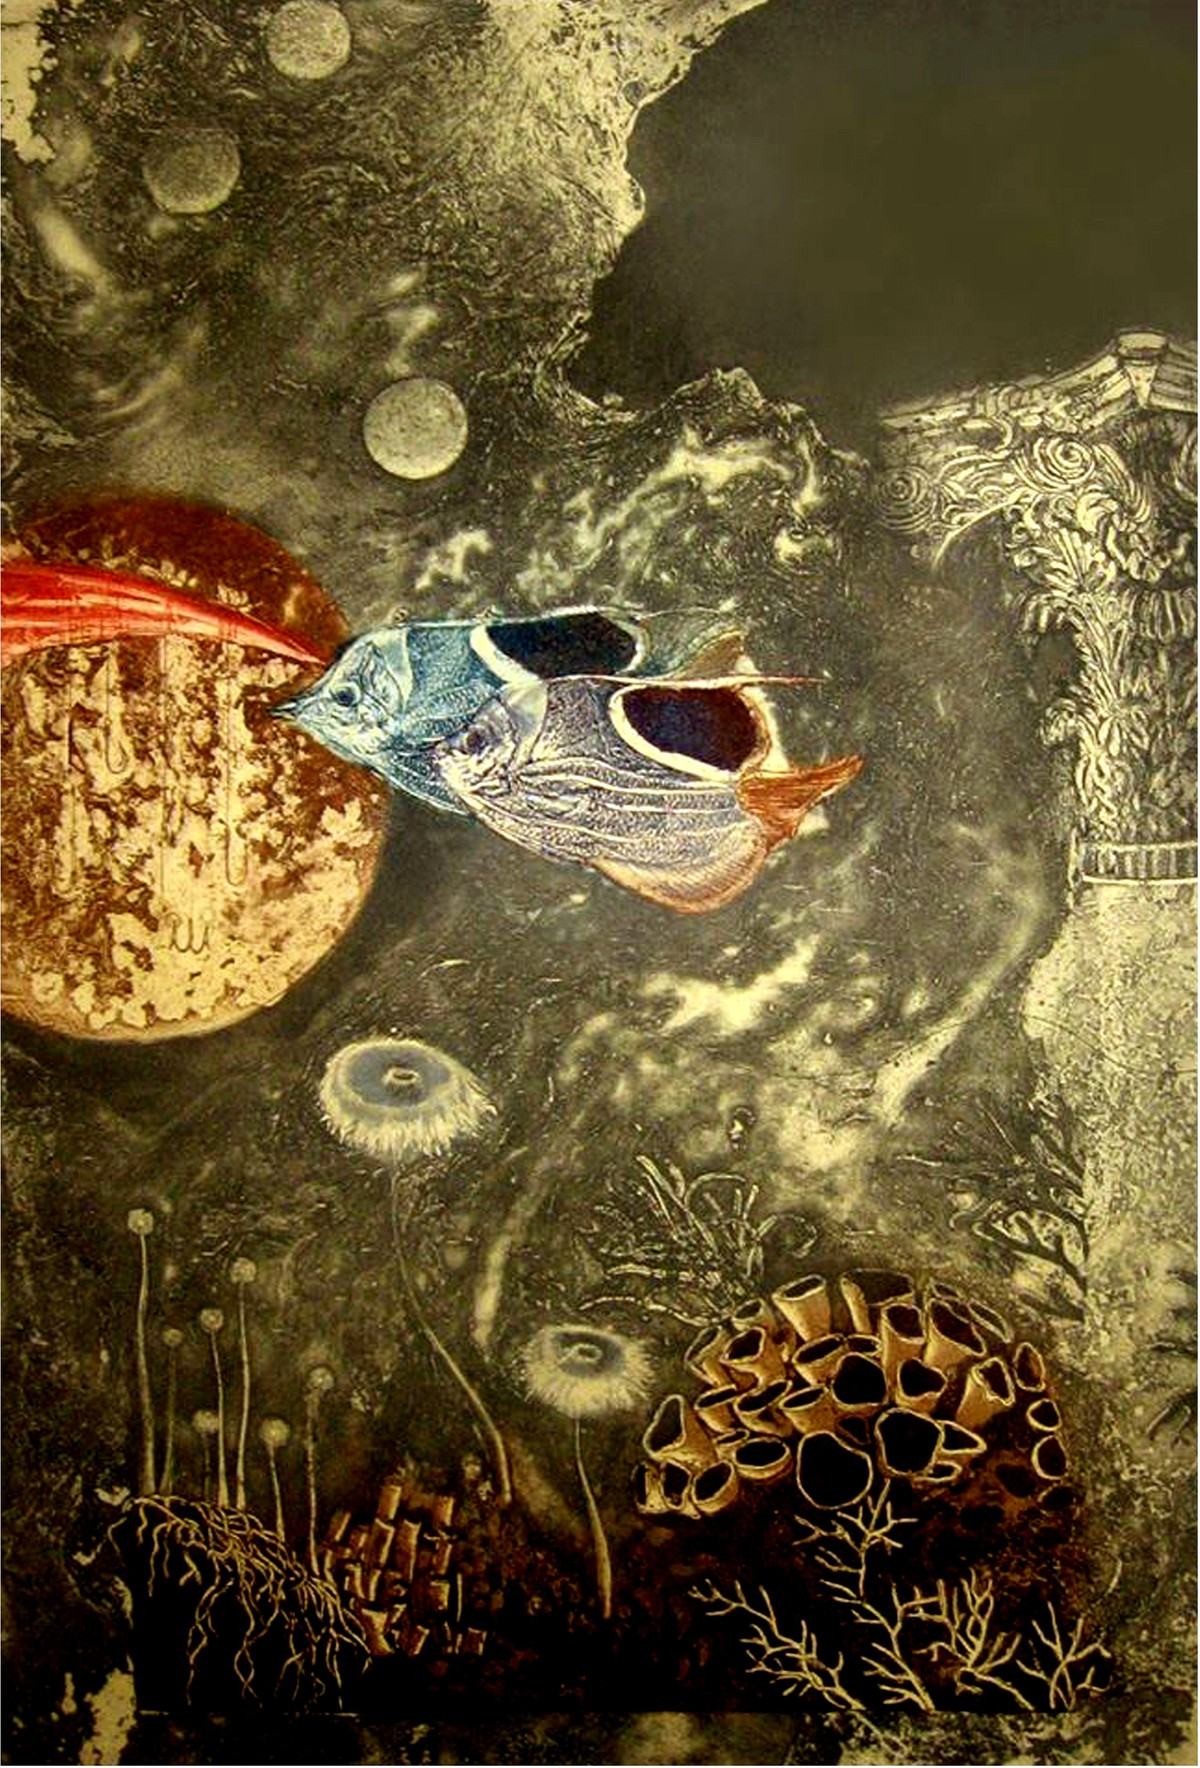 Aqua Life 2 by Jyotirmay Dalapati, Surrealism Printmaking, Etching on Paper, Brown color